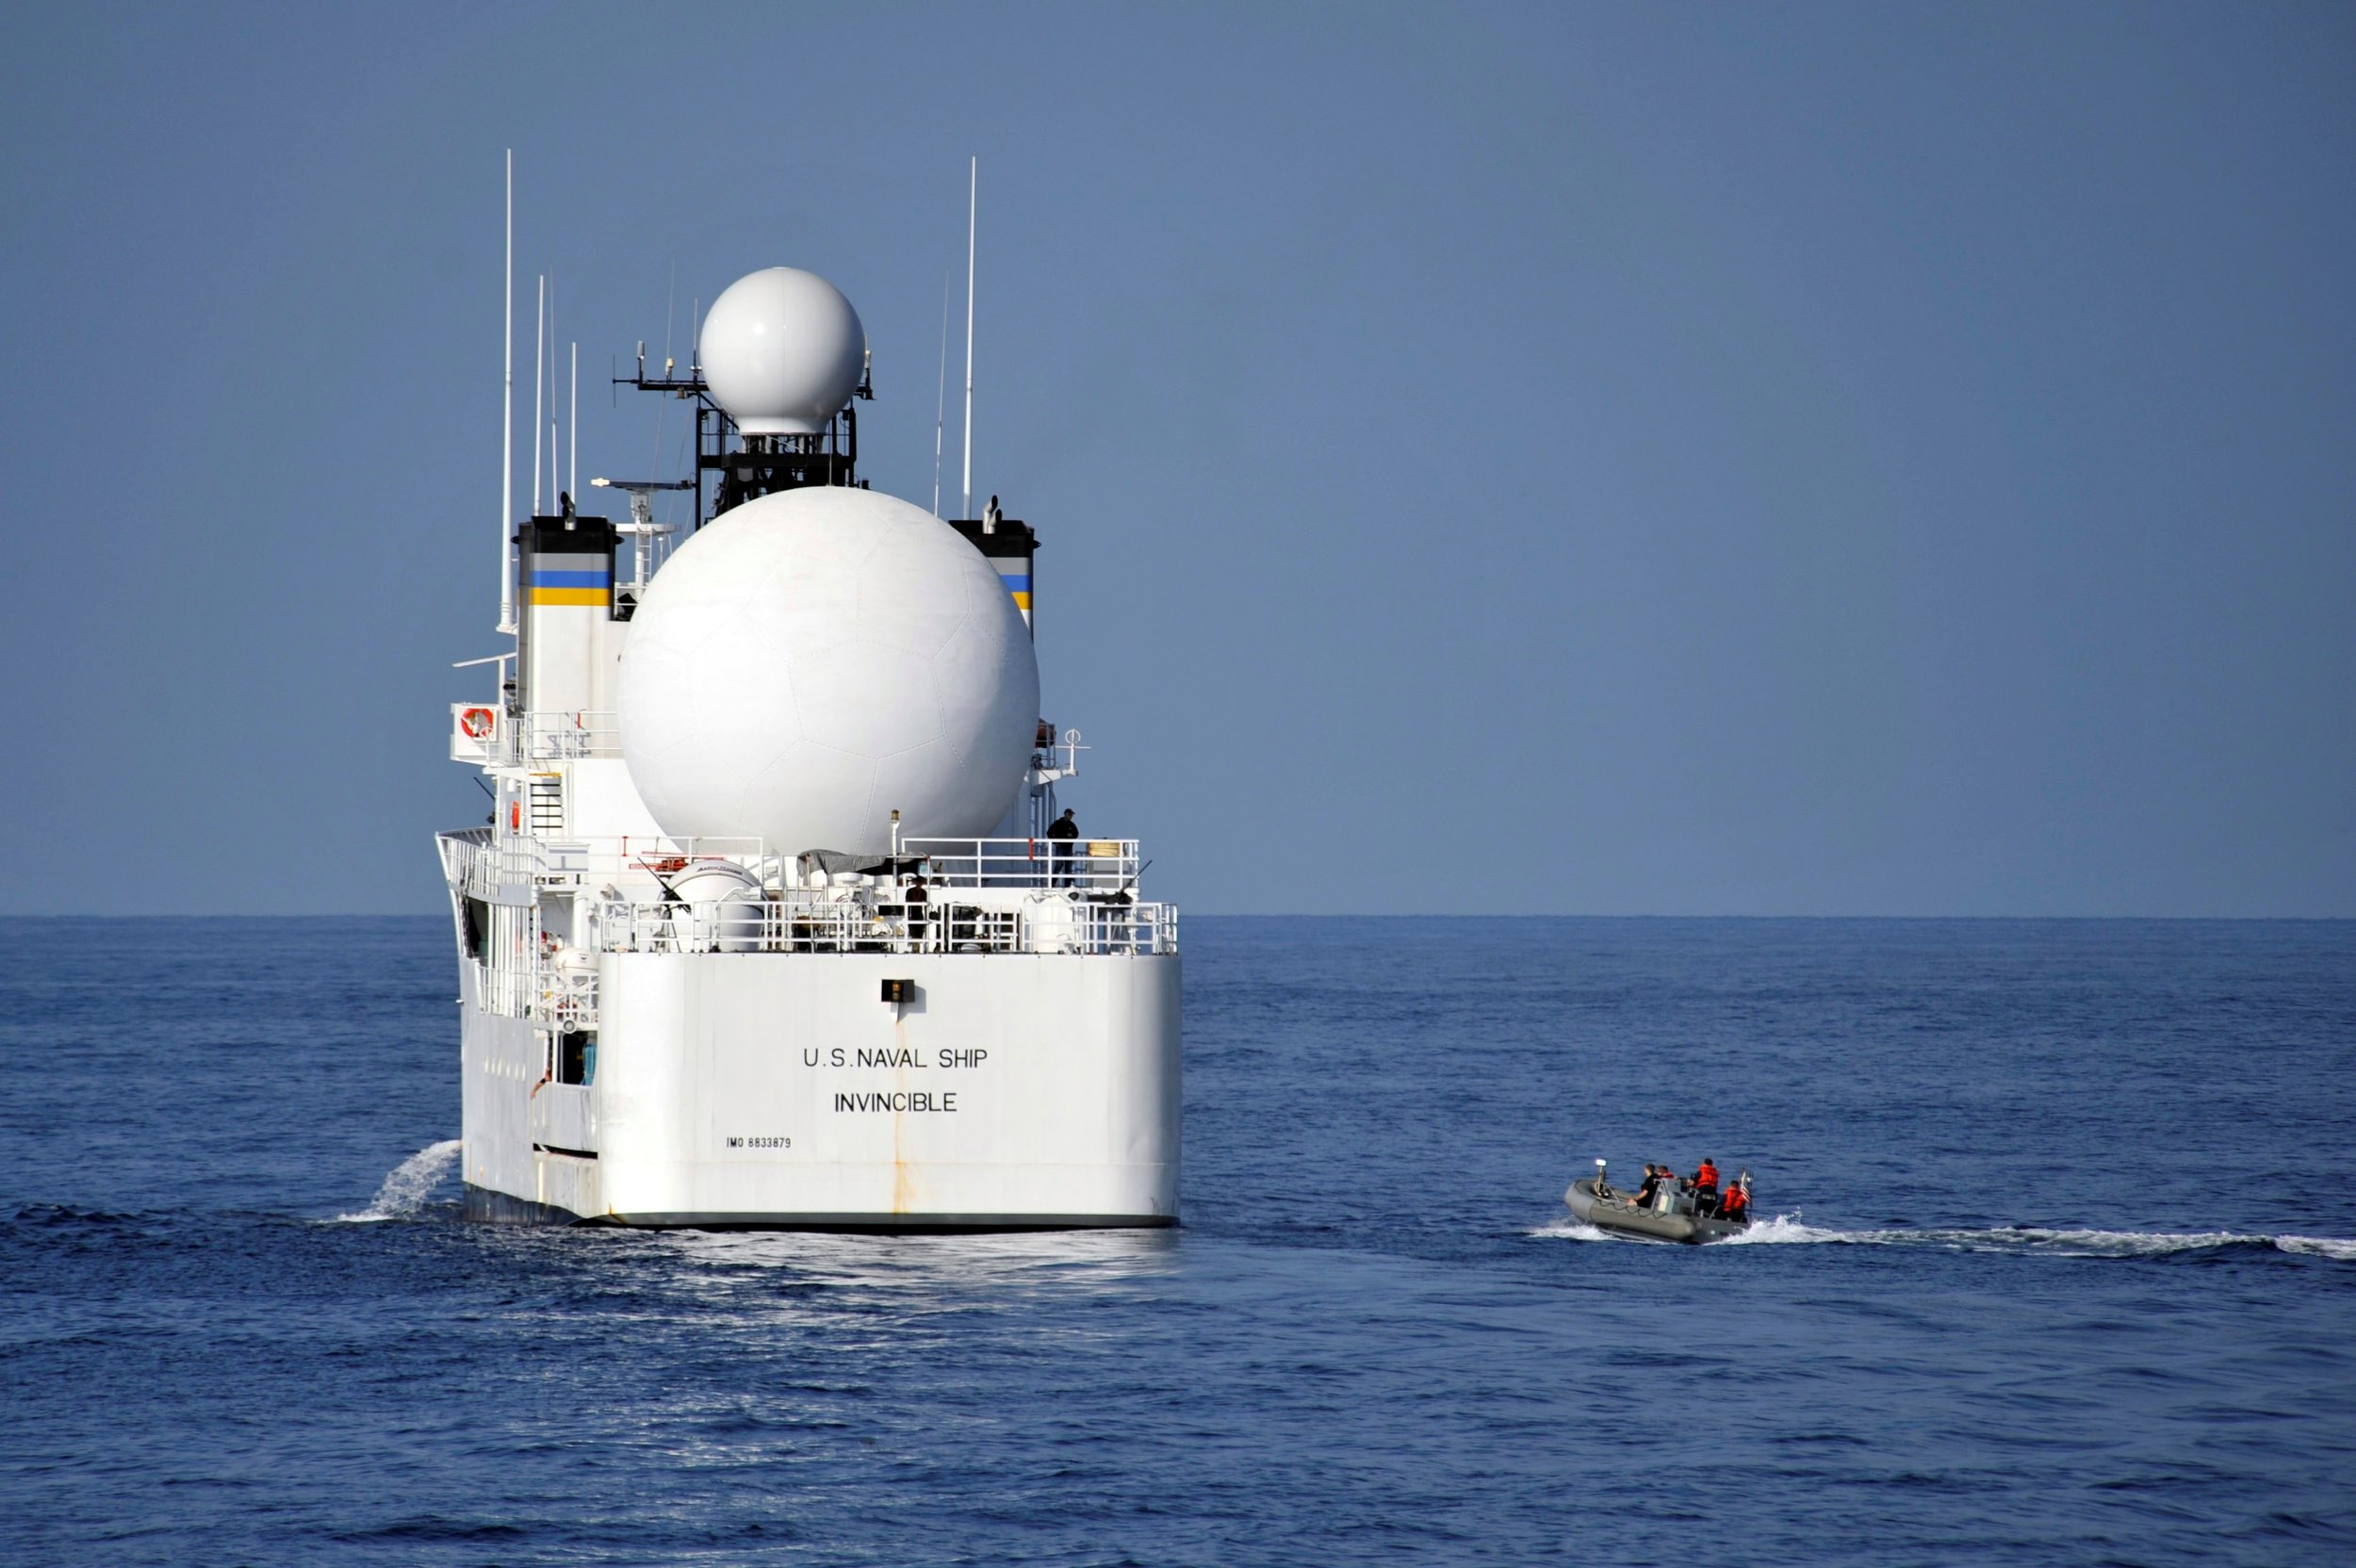 Ship in South China Sea